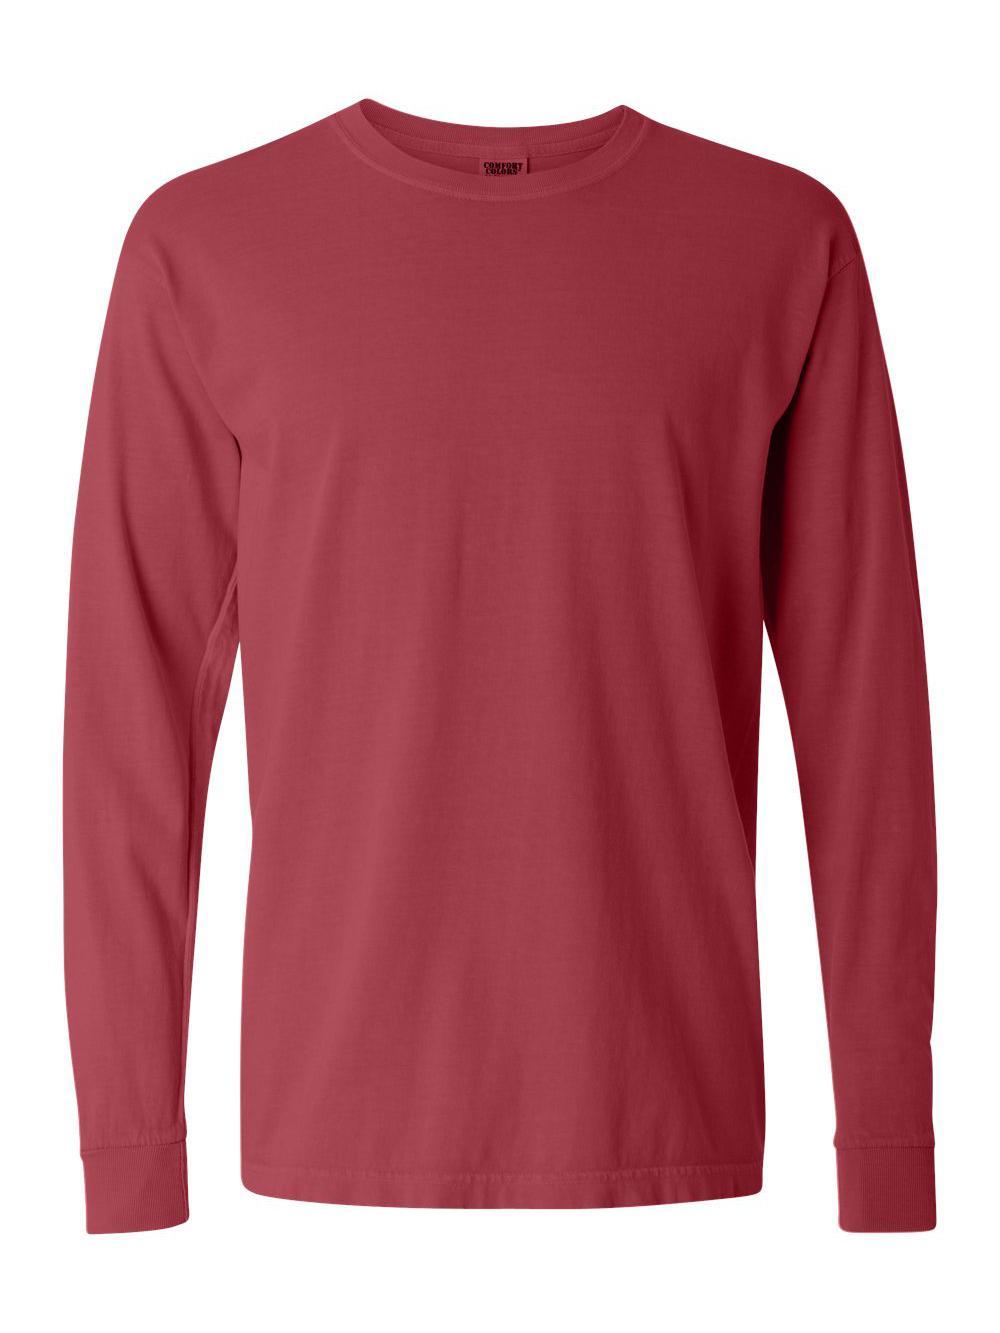 Comfort-Colors-Garment-Dyed-Heavyweight-Ringspun-Long-Sleeve-T-Shirt-6014 thumbnail 30